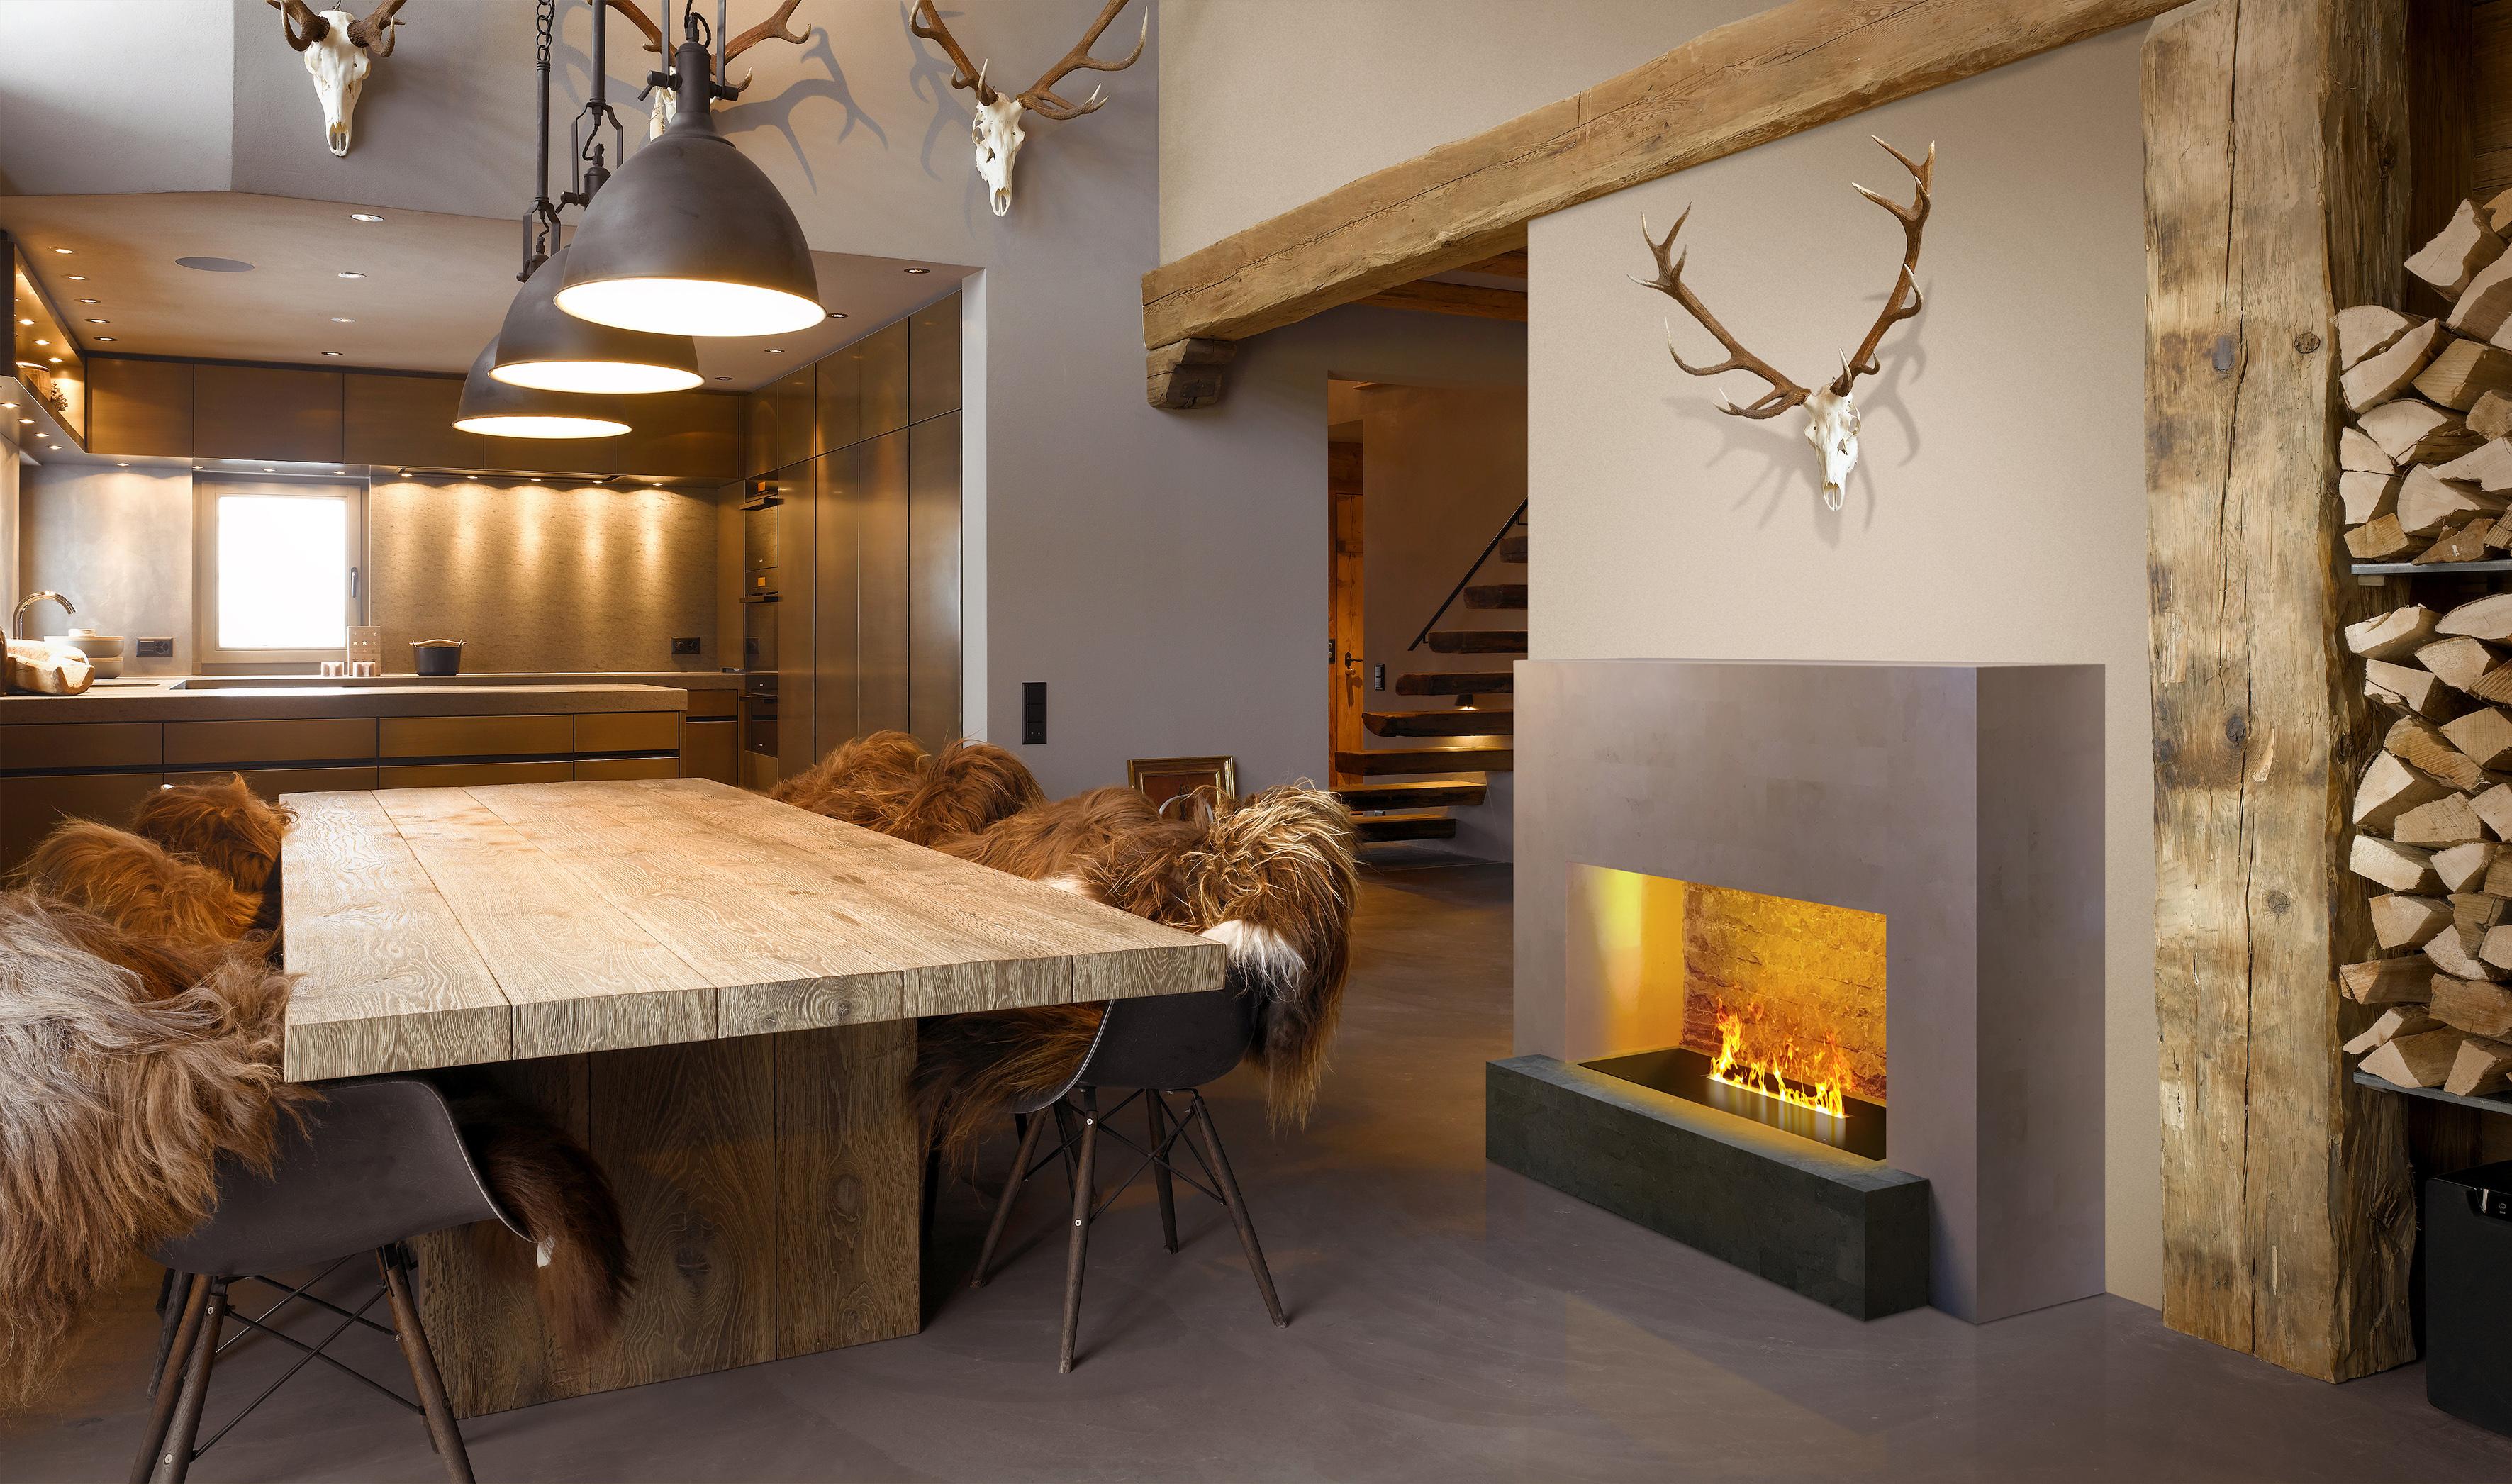 piz bernina schori. Black Bedroom Furniture Sets. Home Design Ideas